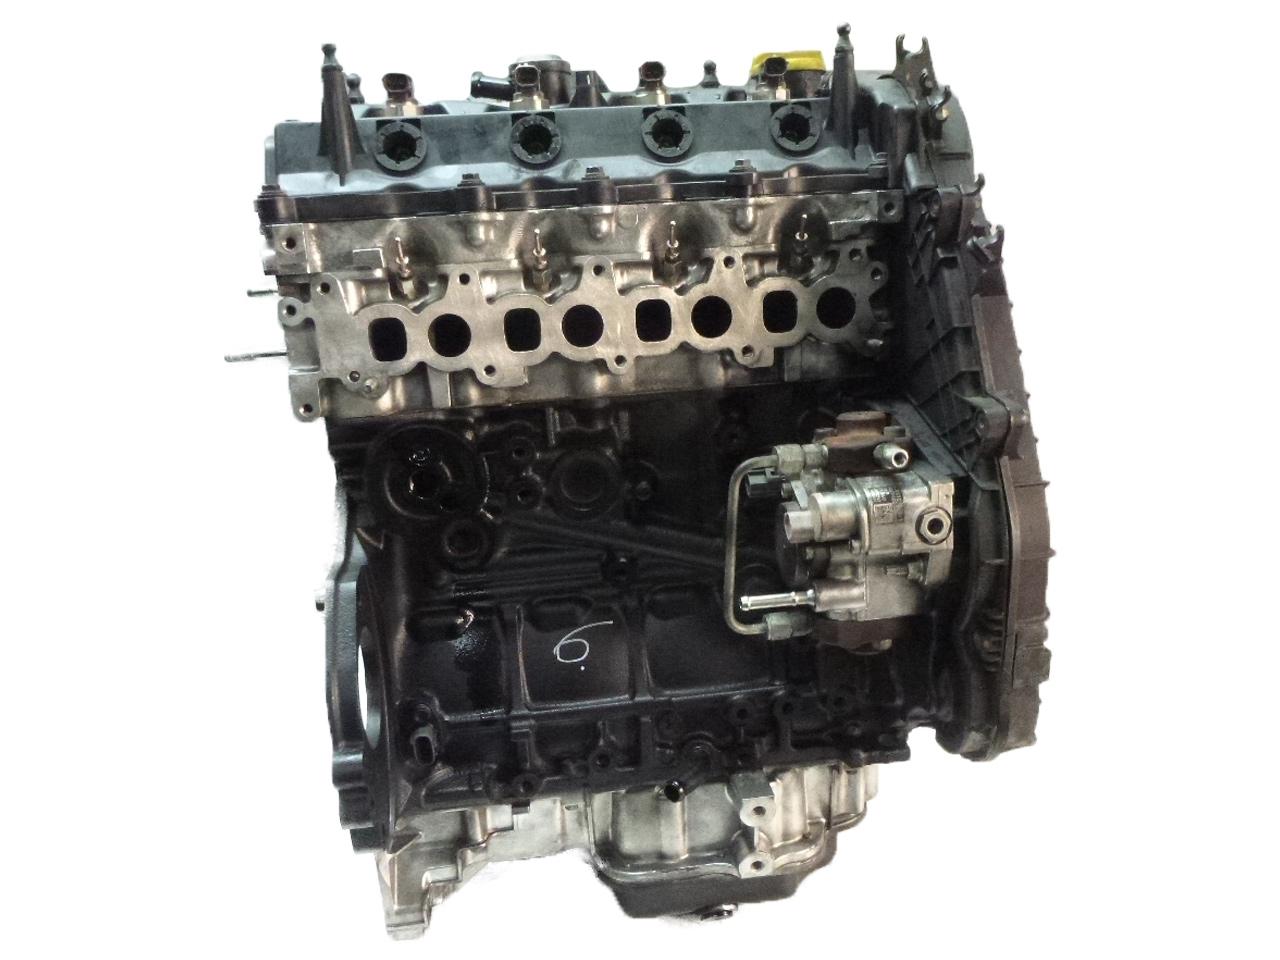 Motor Opel Corsa Meriva Astra 1,7 CDTI Diesel Z17 Z17DTR mit Düsen